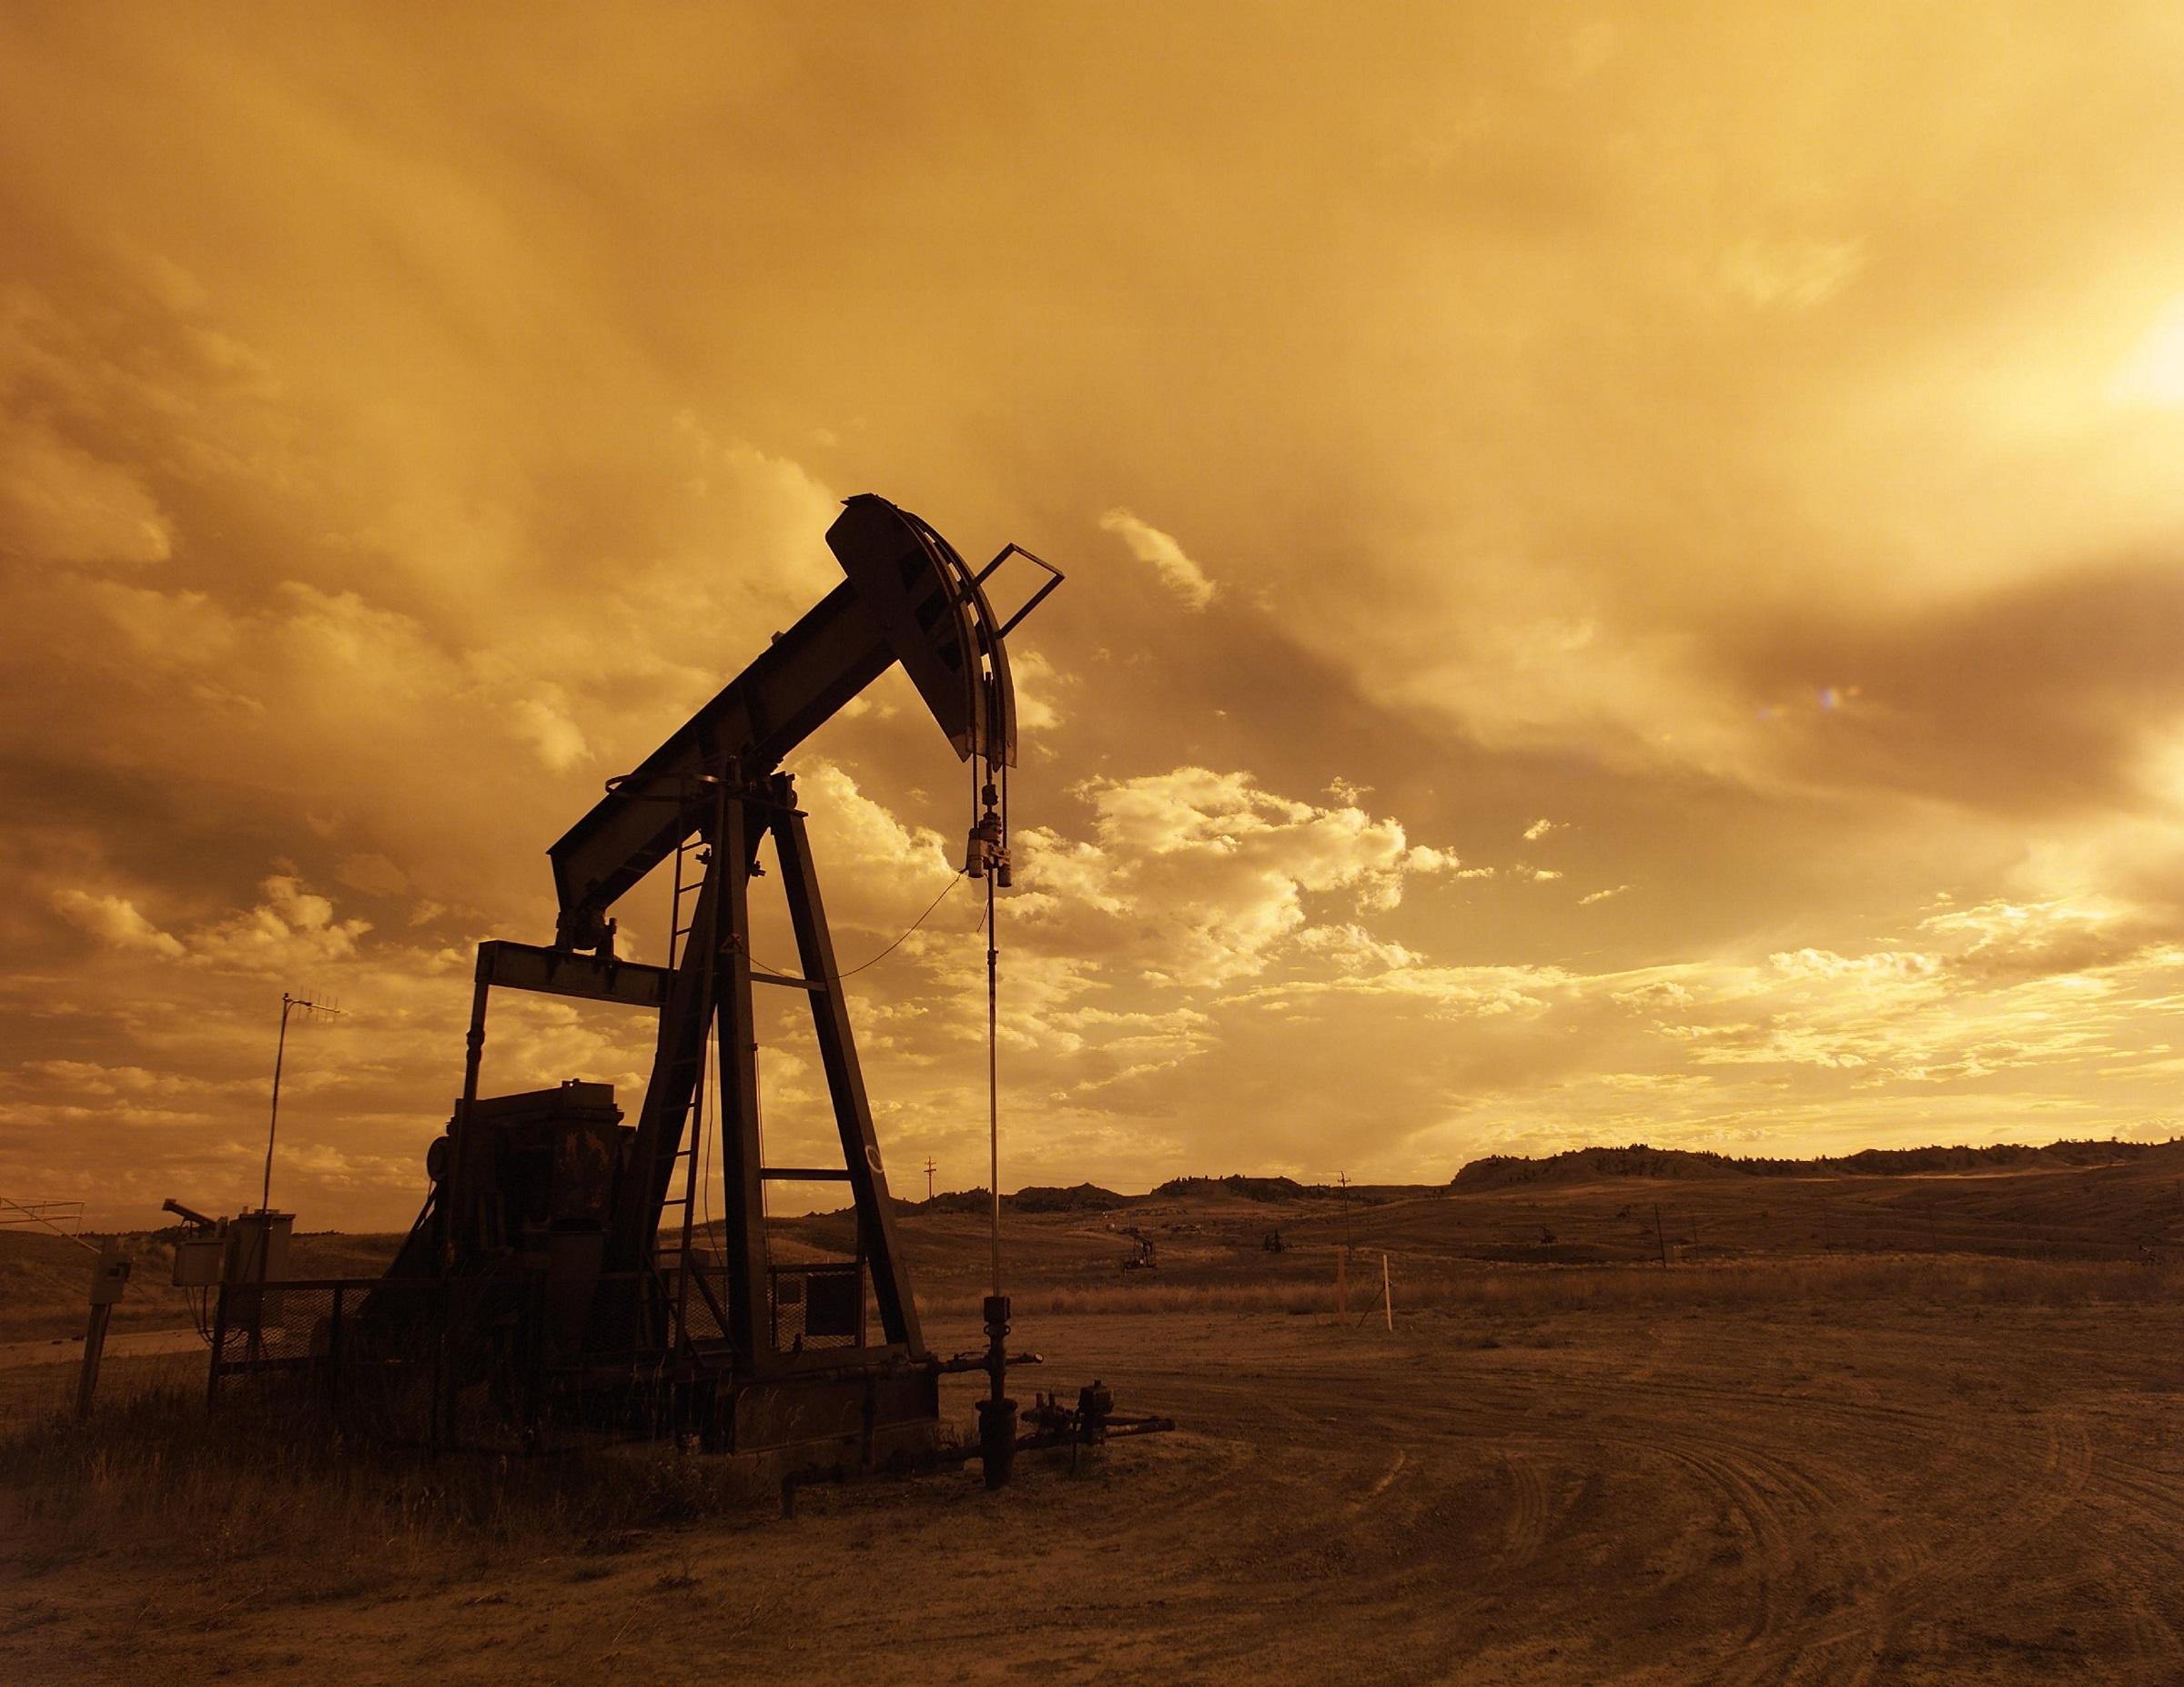 oil-pump-jack-sunset-clouds-silhouette-162568